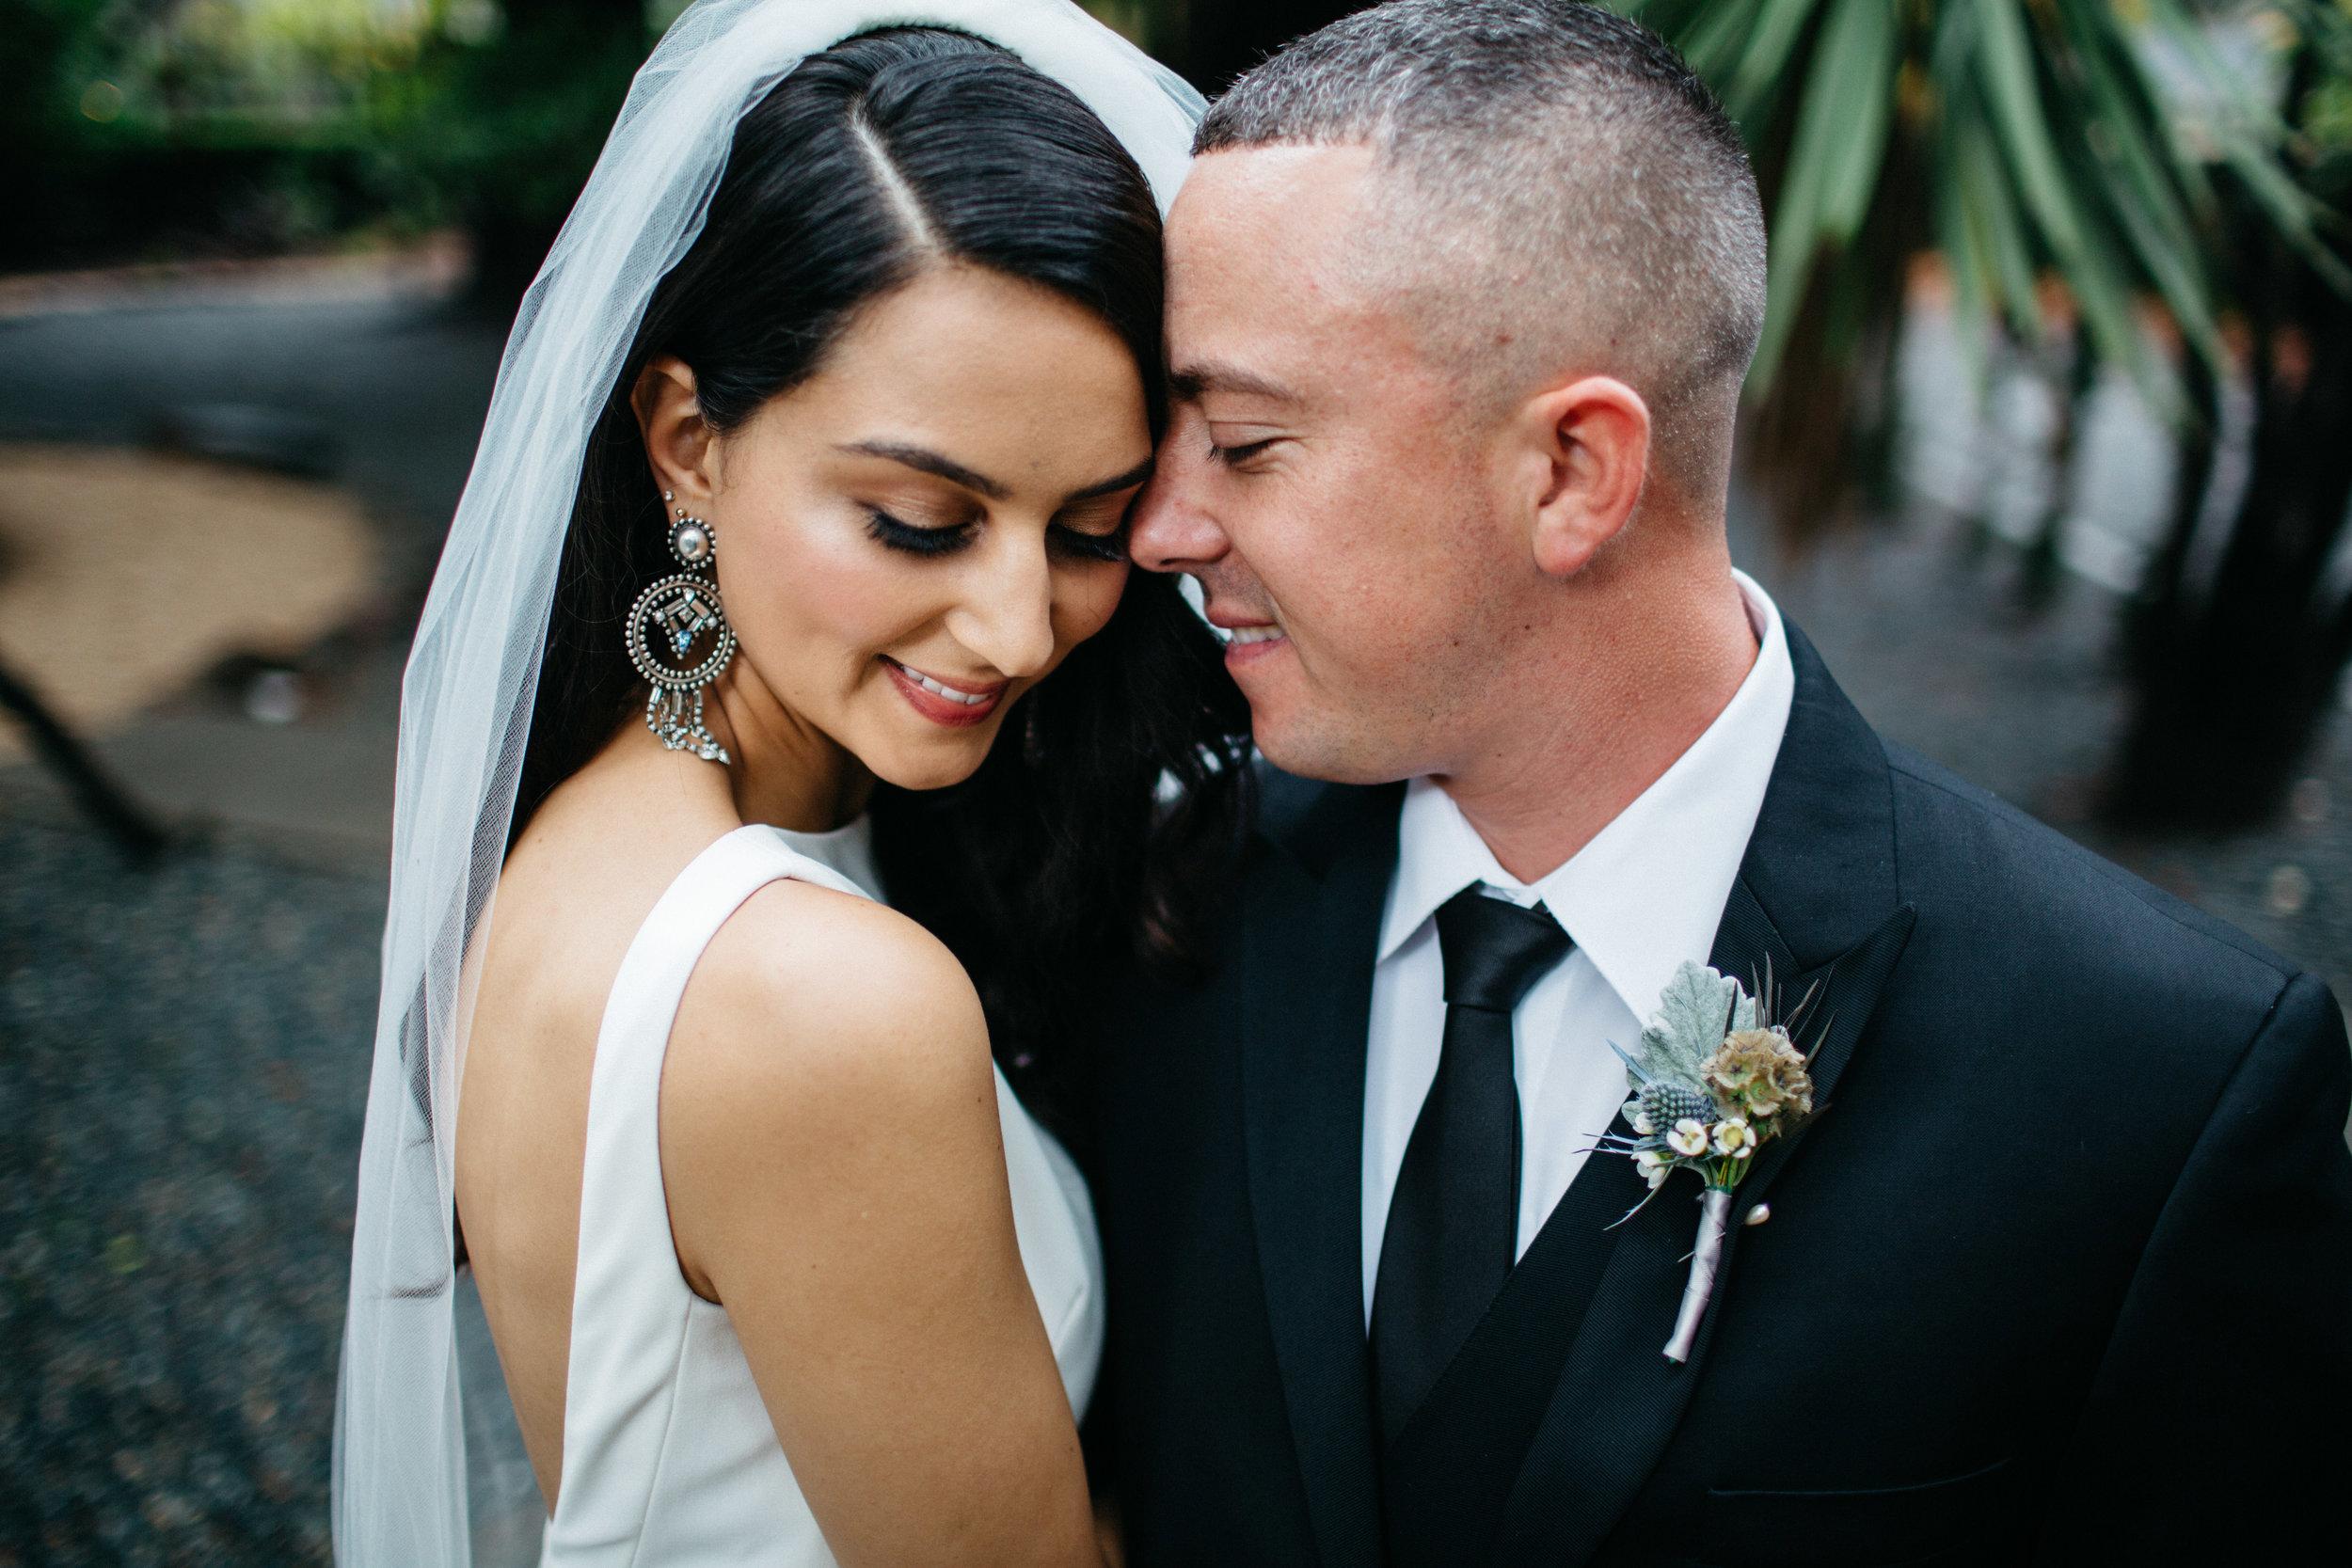 sweet_and_crafty_jocelyn_domingo_wedding_portfolio_035.jpg